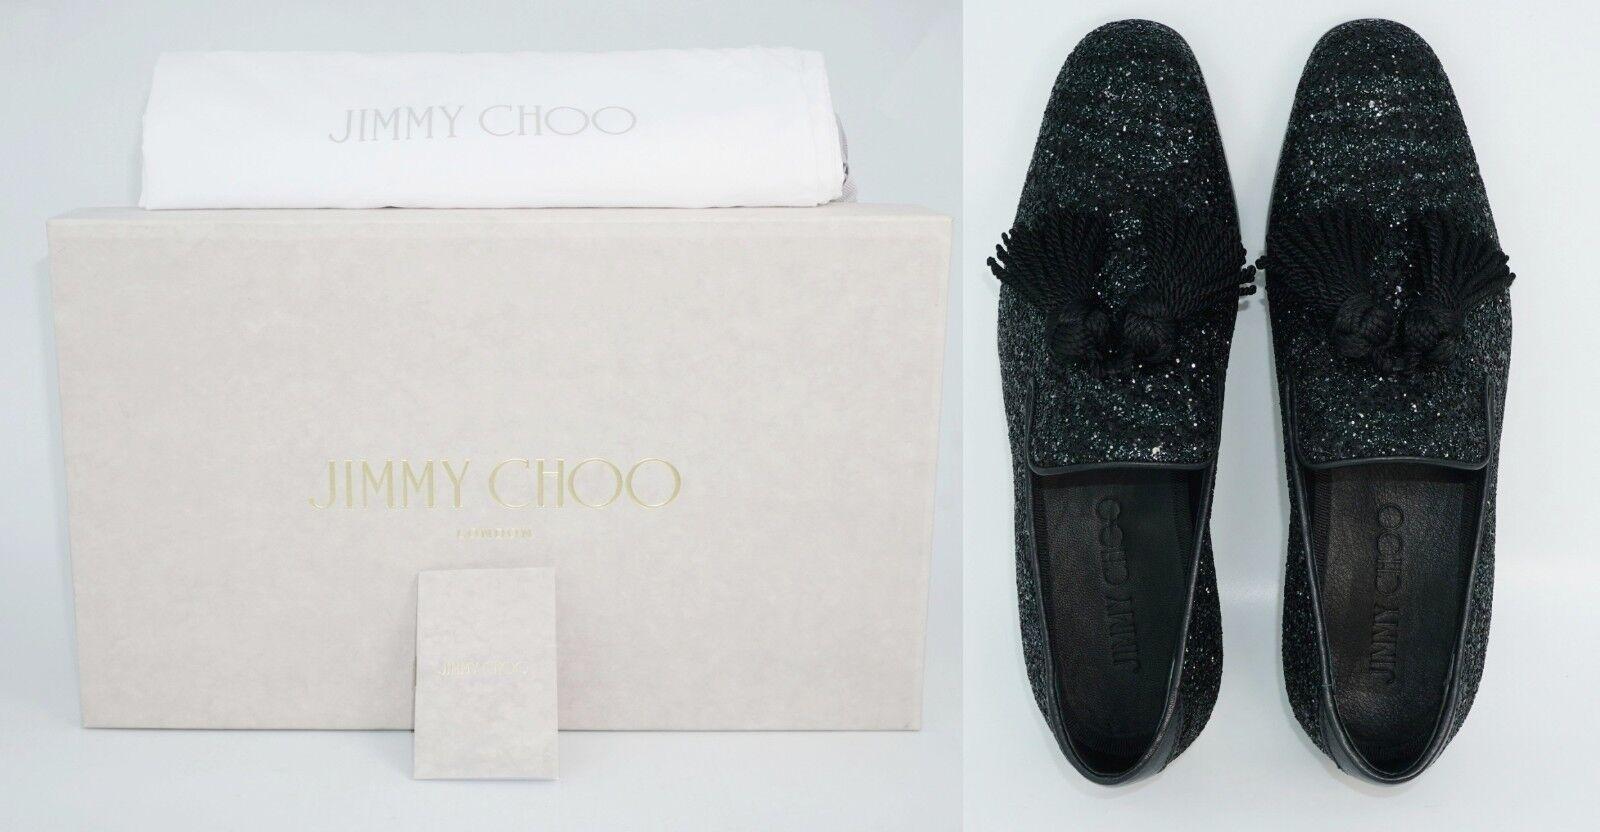 2a5d21832d0 Jimmy Choo Men s  foxley  Coarse Glitter Leather Tassel Loafer Black for  sale online